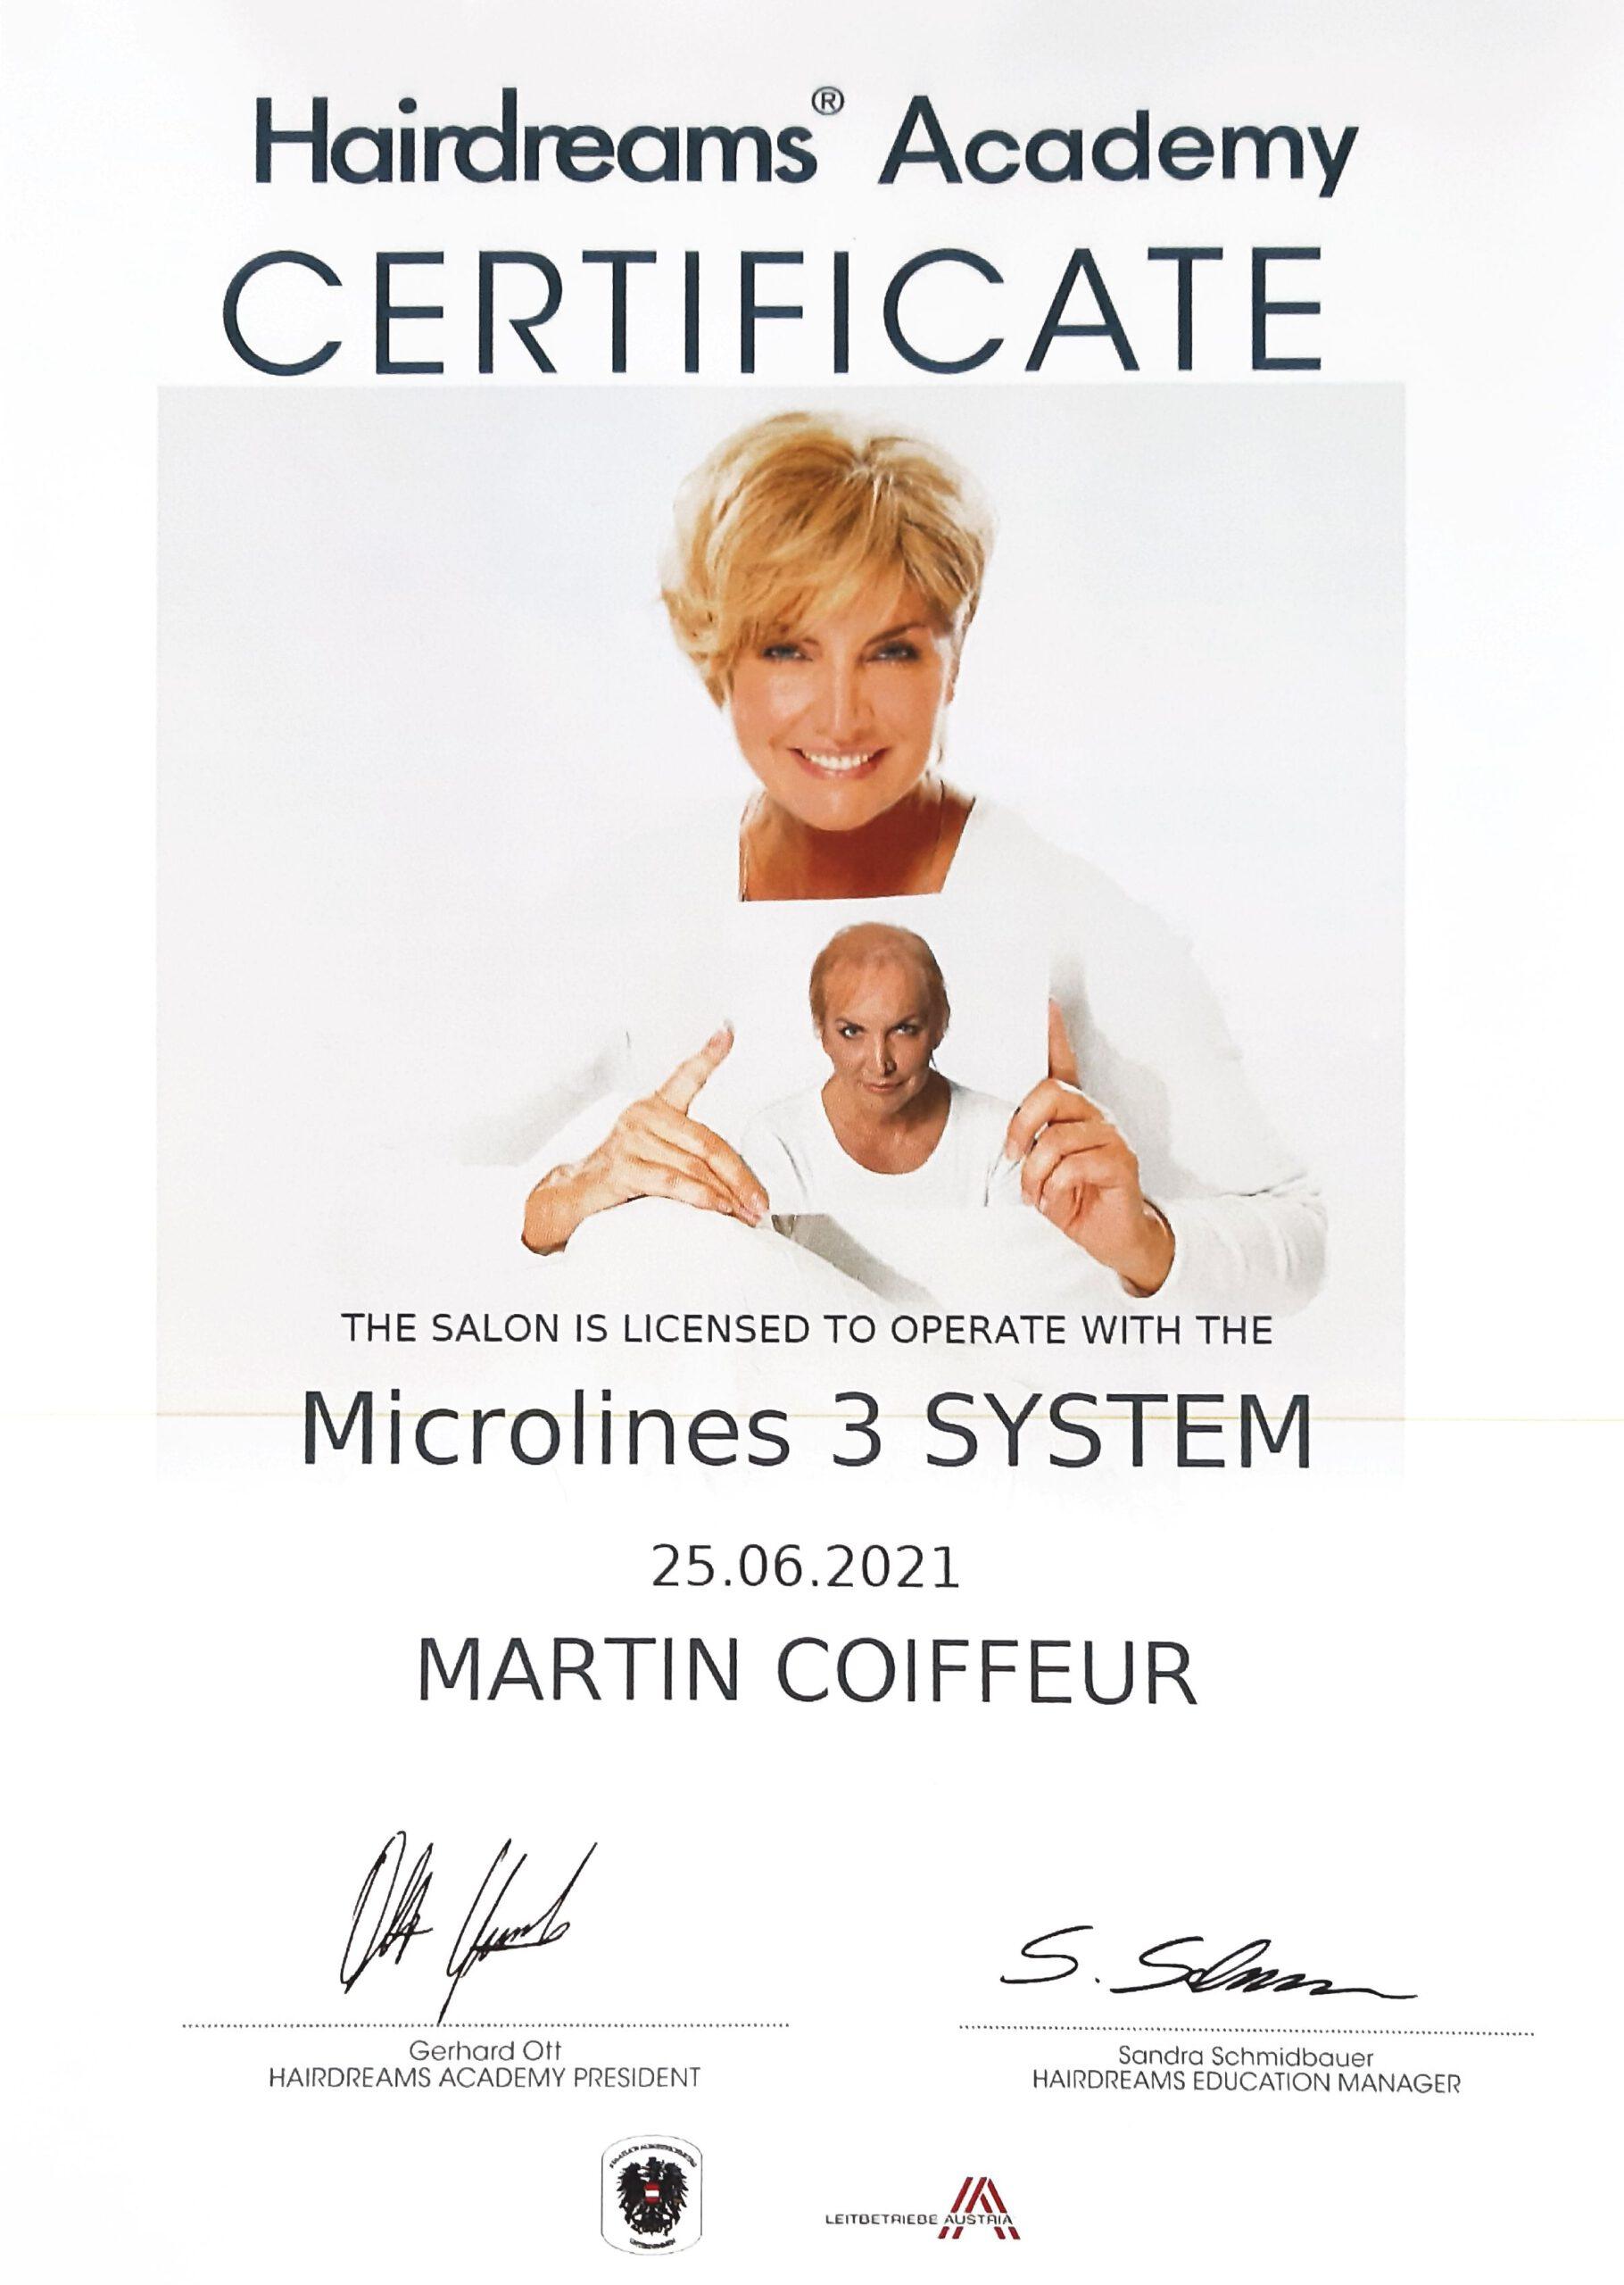 Microlines 3 System